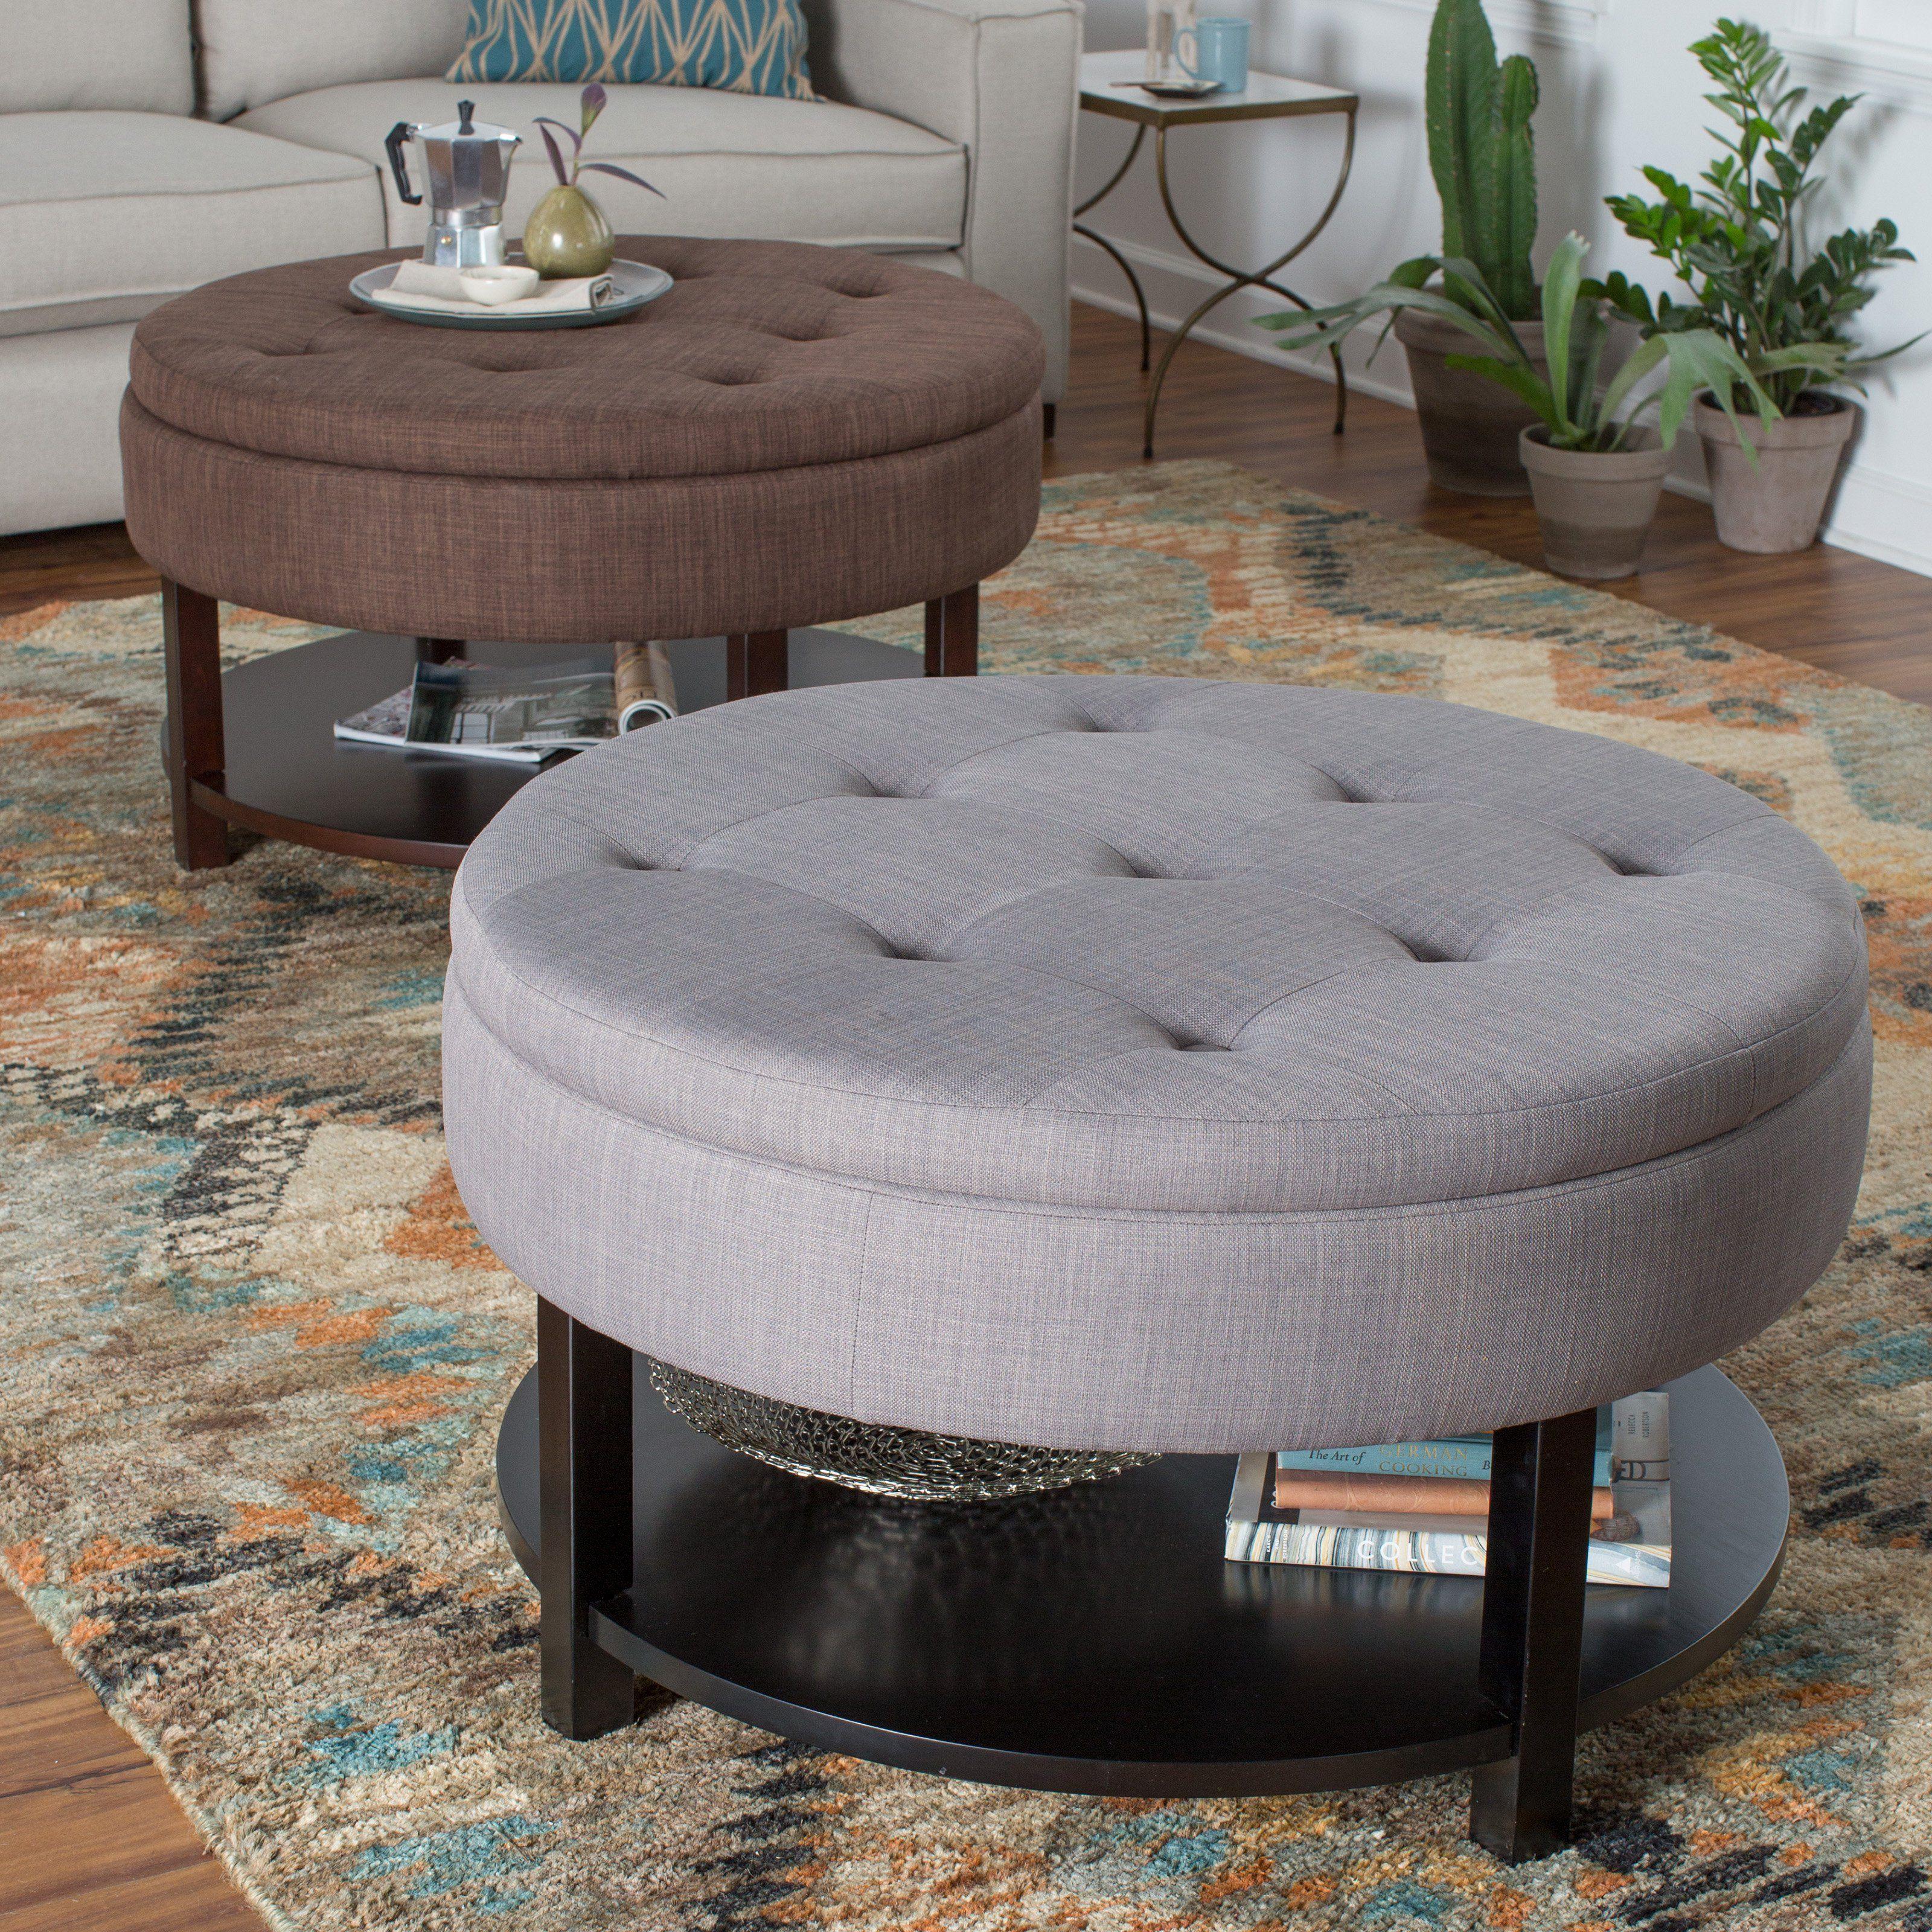 Belham living dalton coffee table storage ottoman with